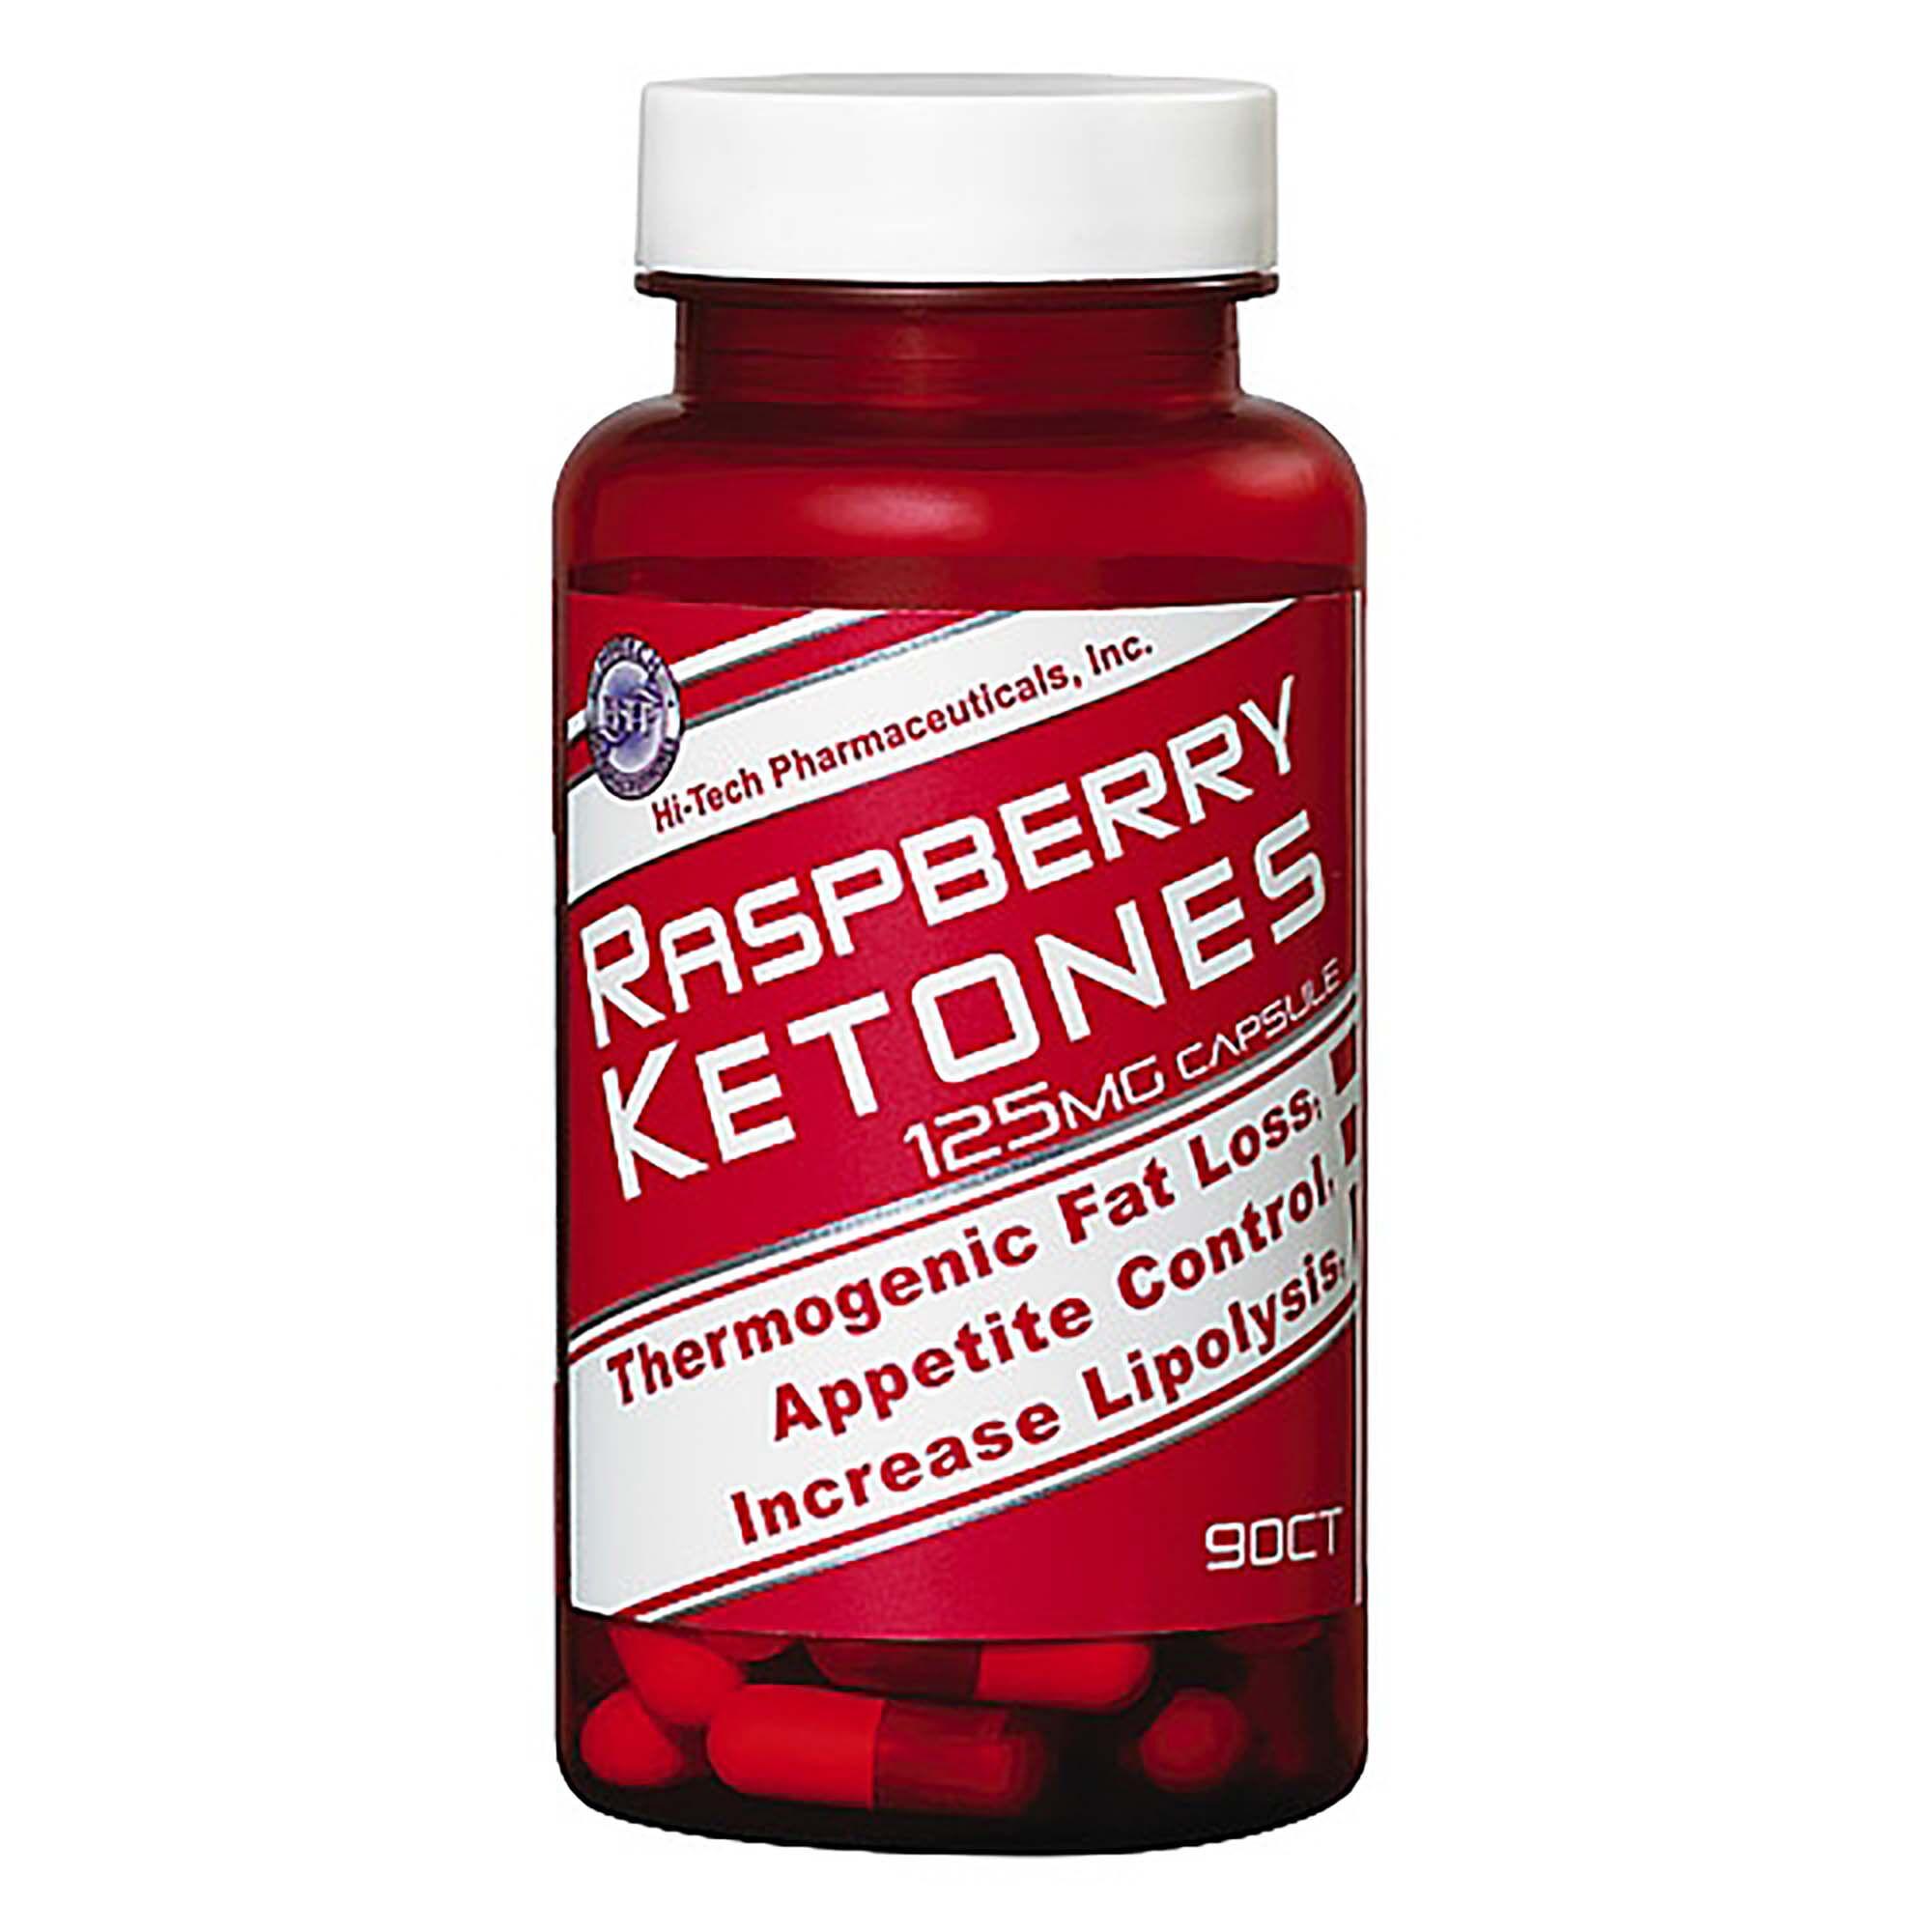 Hi Tech Pharmaceuticals Raspberry Ketones Gnc